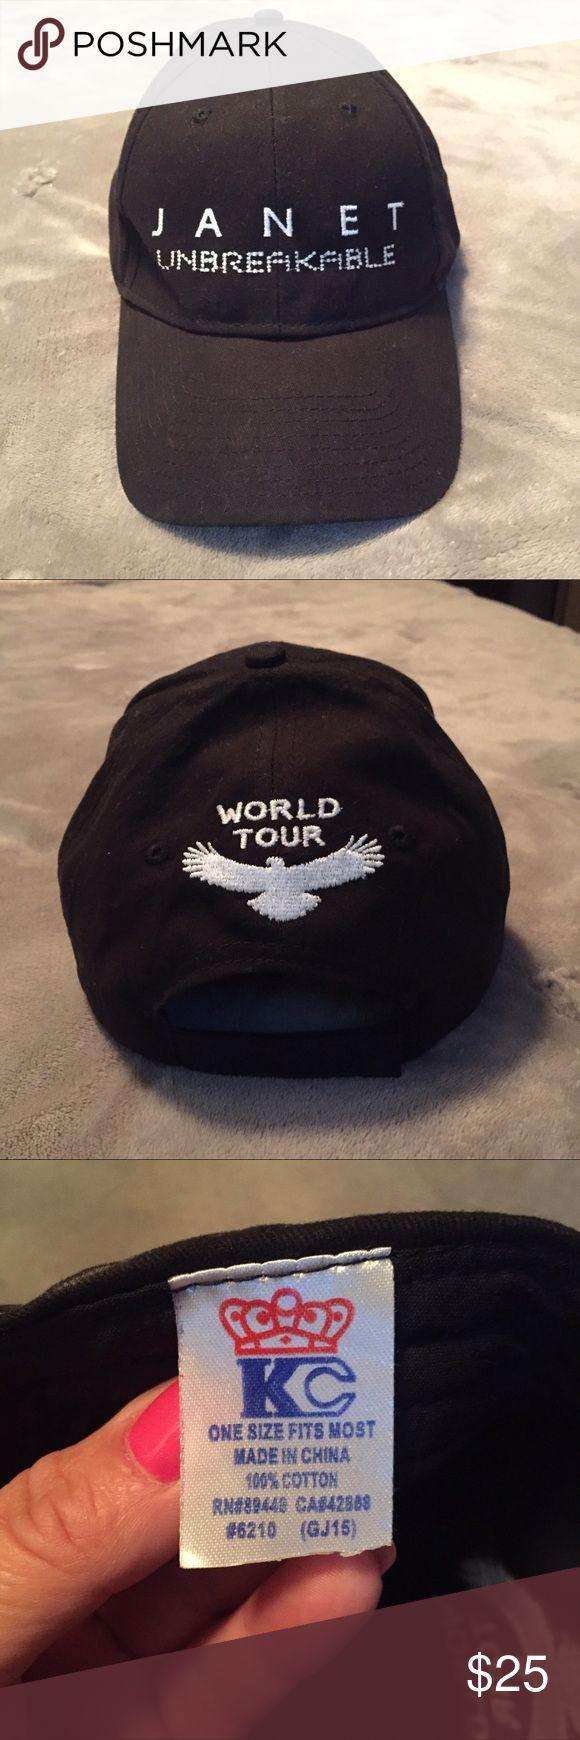 Janet Jackson Unbreakable world tour hat, black Janet Jackson Unbreakable world tour hat, black Other